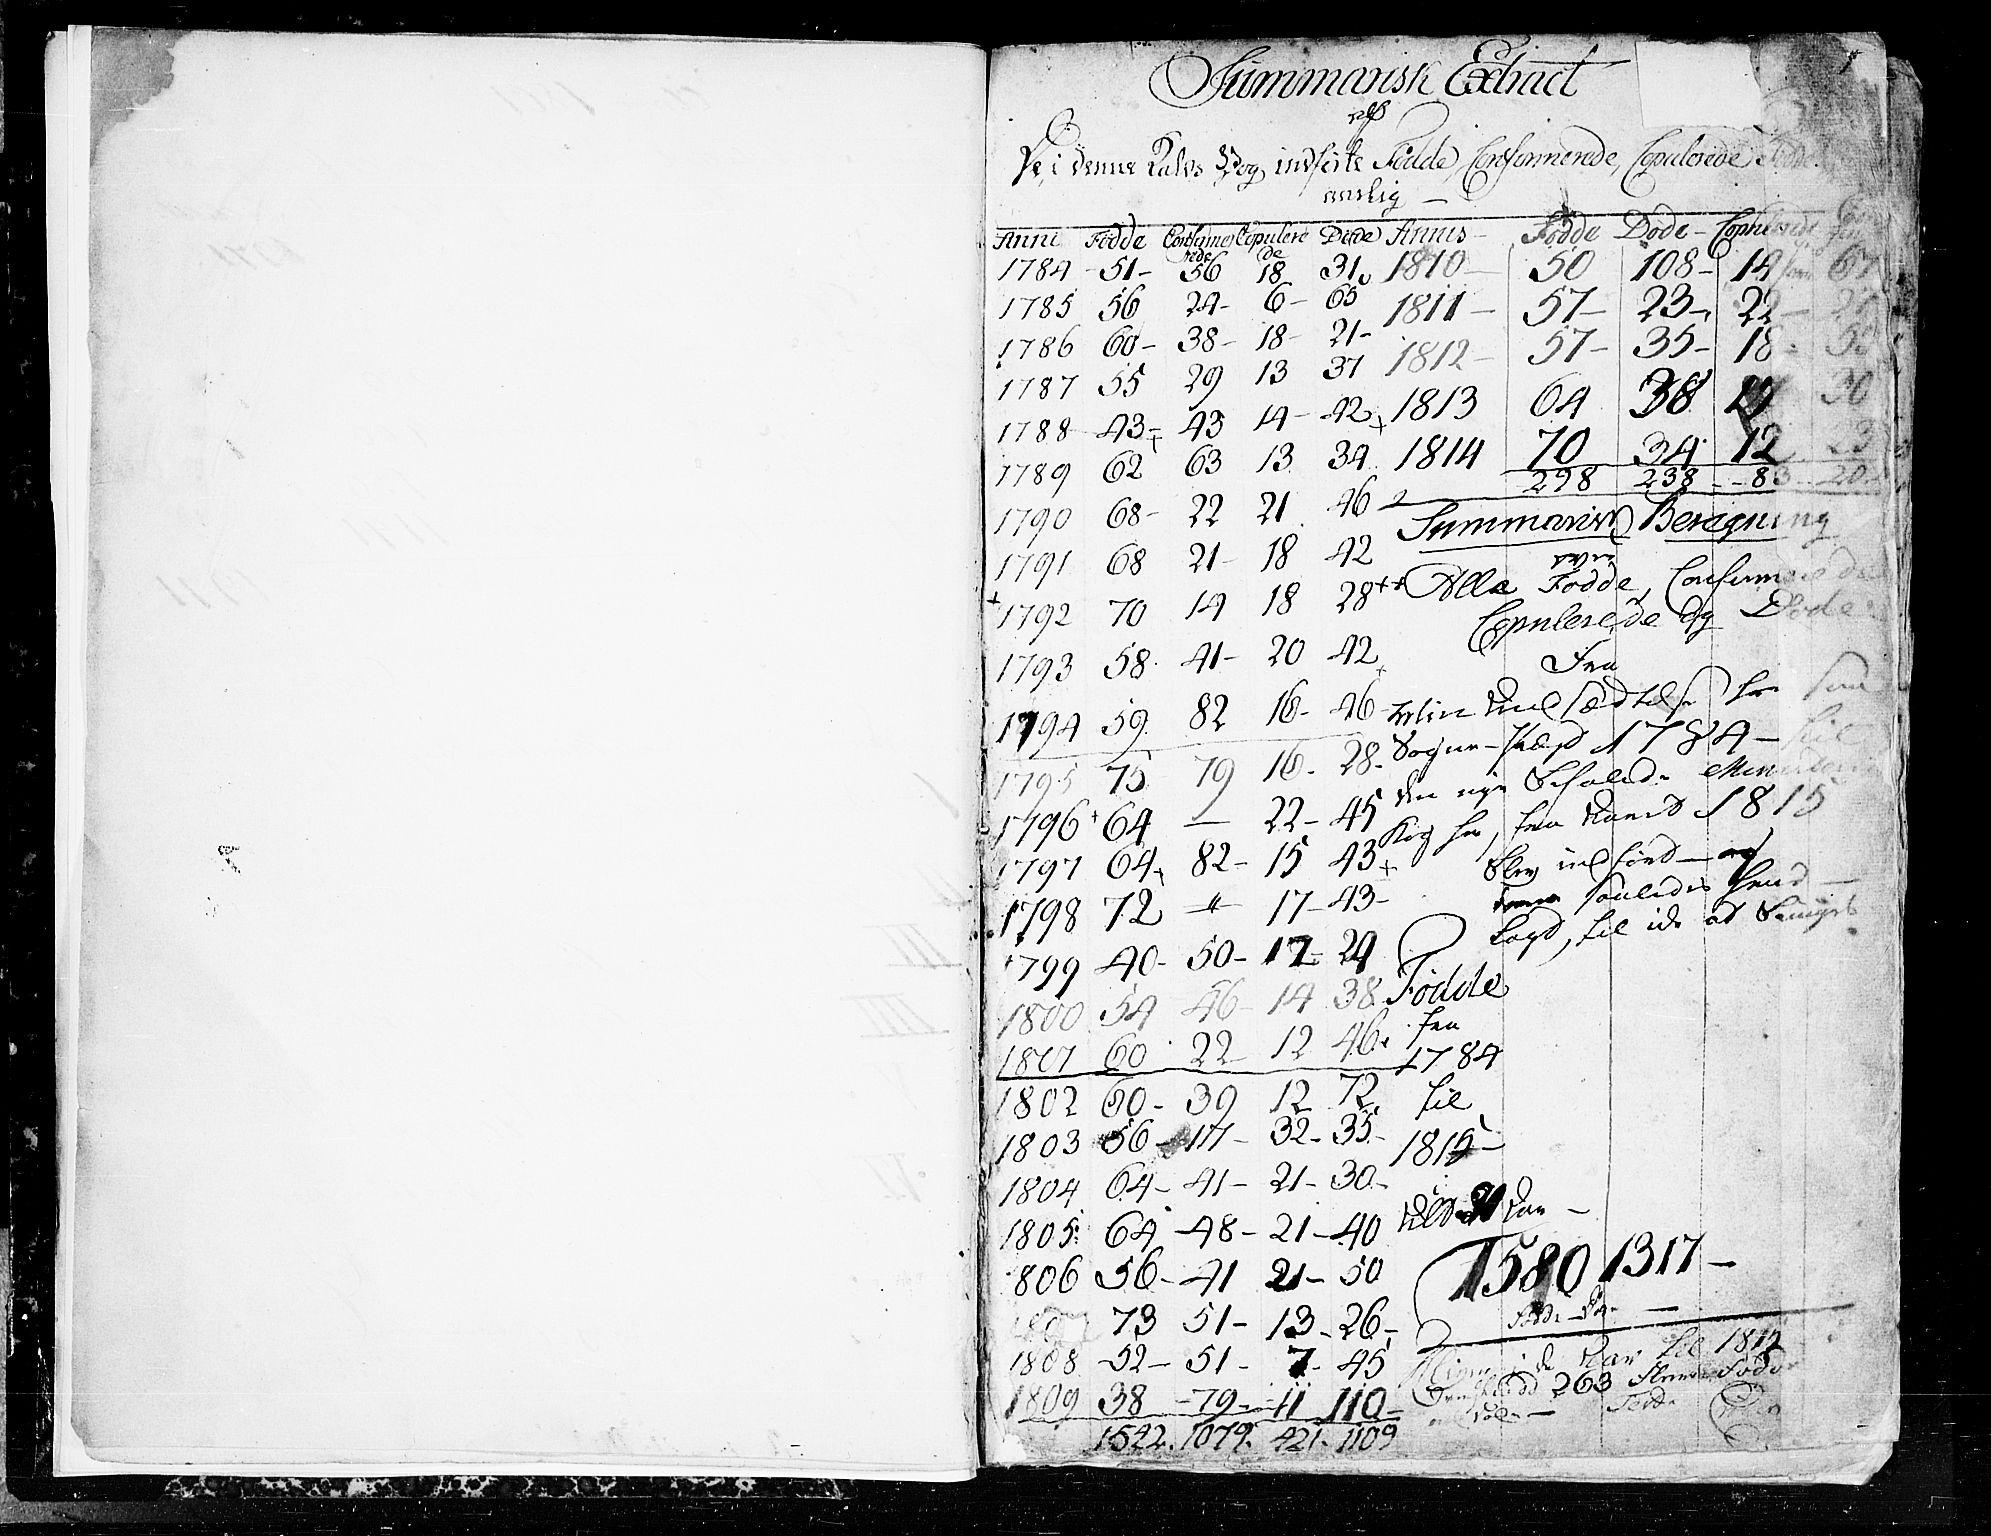 SAKO, Heddal kirkebøker, F/Fa/L0004: Parish register (official) no. I 4, 1784-1814, p. 1